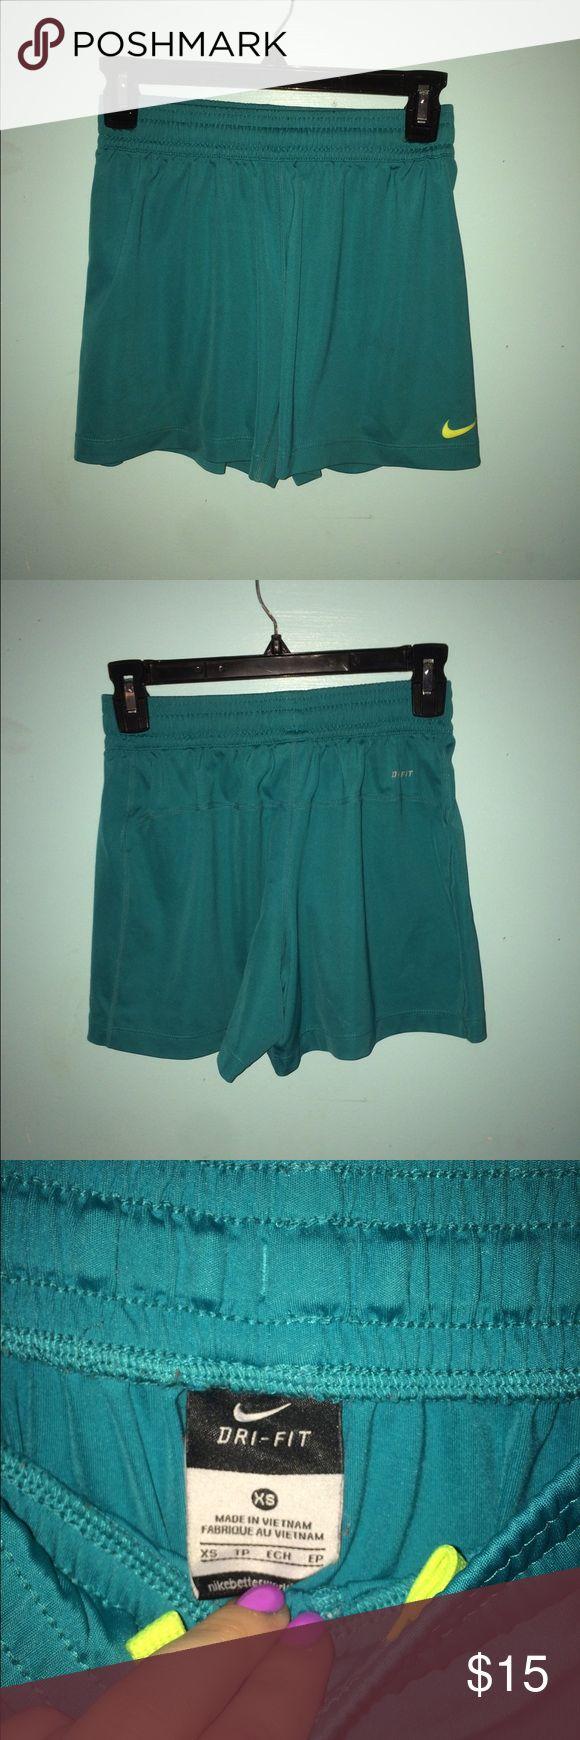 Nike soccer shorts Teal Nike shorts perfect for soccer. Nike Shorts